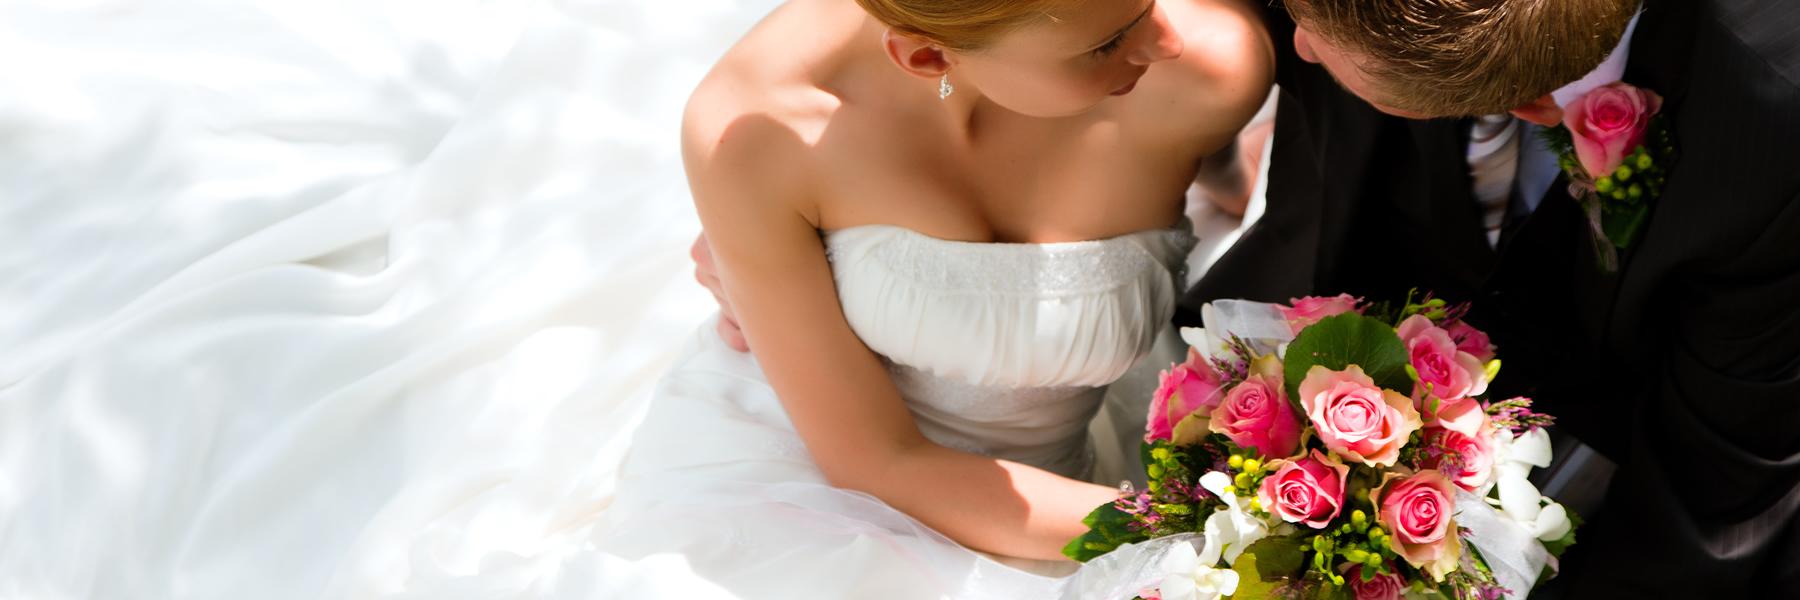 bodas_prueba